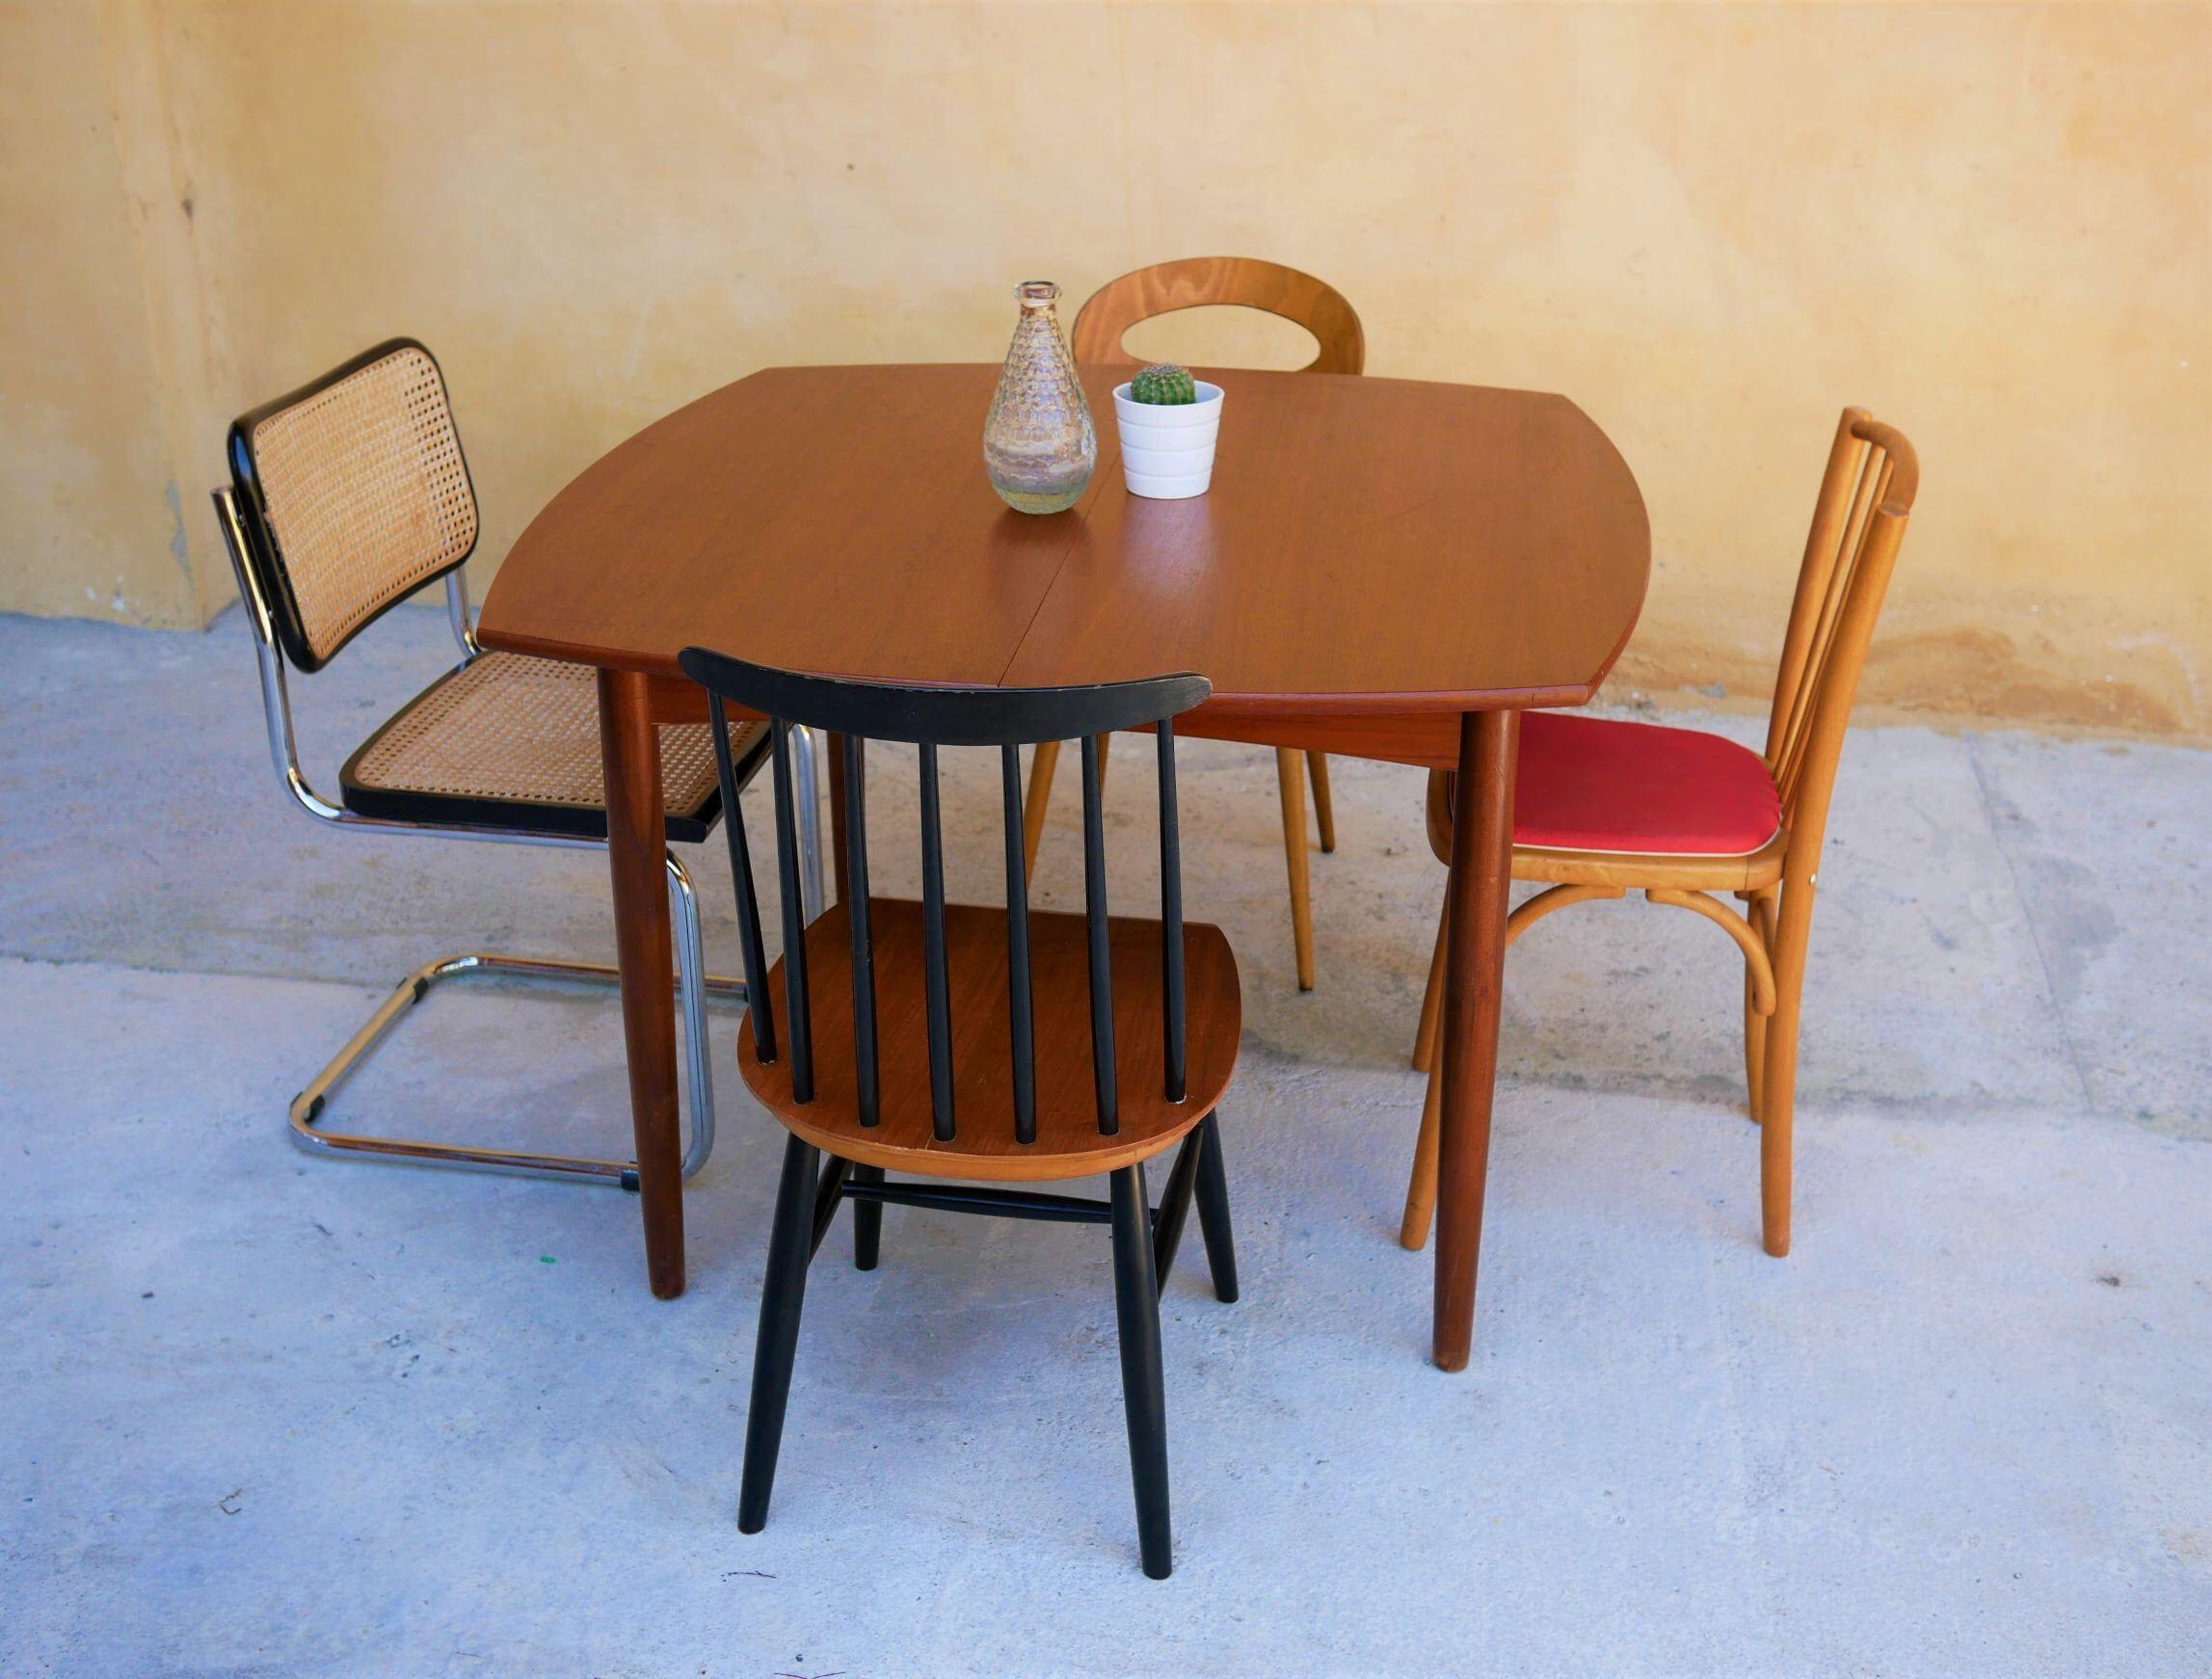 Table A Manger Scandinave Extensible En Teck Par Henry Walter Klein Vintage En 2019 Table Salle A Manger Table A Manger Scandinave Et Table A Manger En Teck